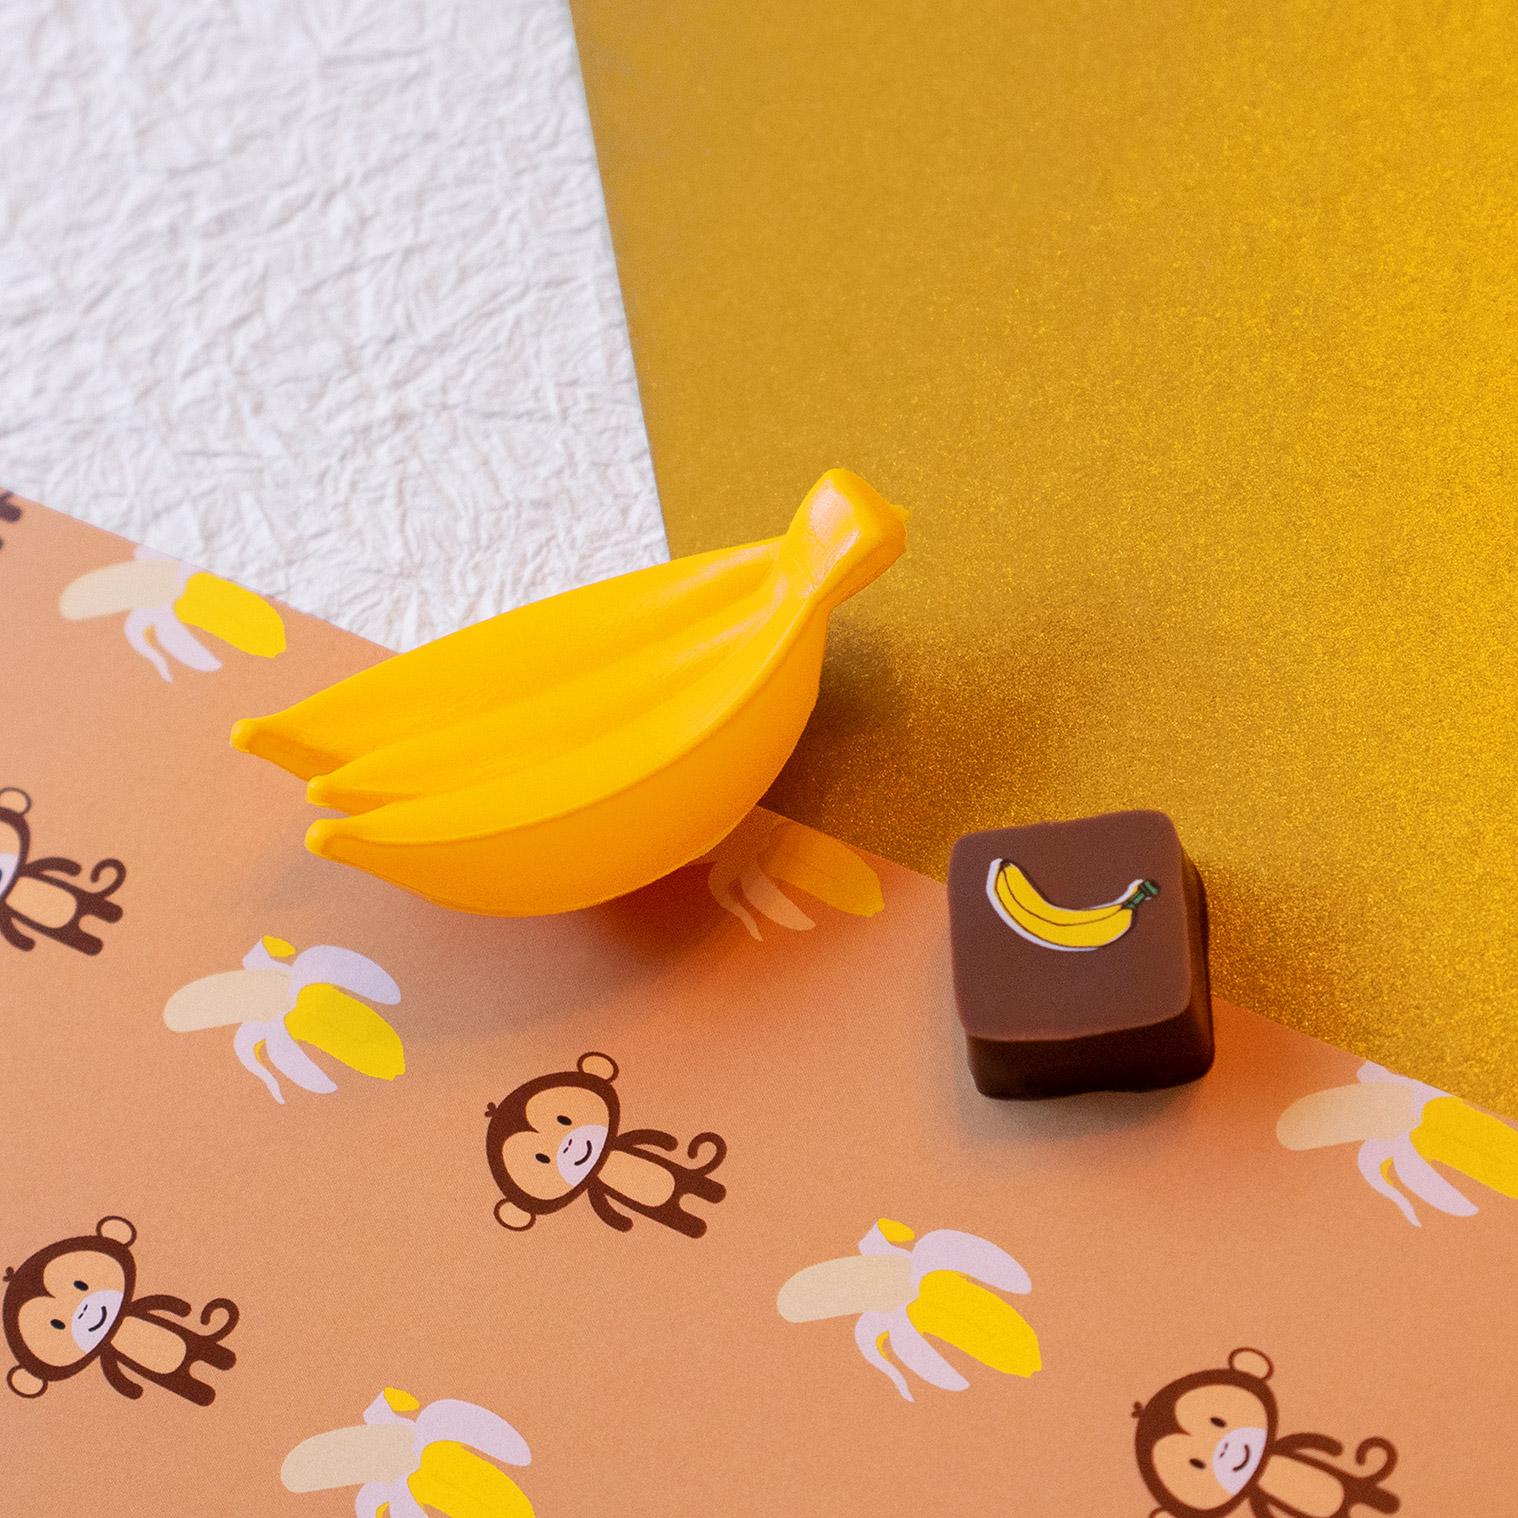 10-ChocolateSquare-15f